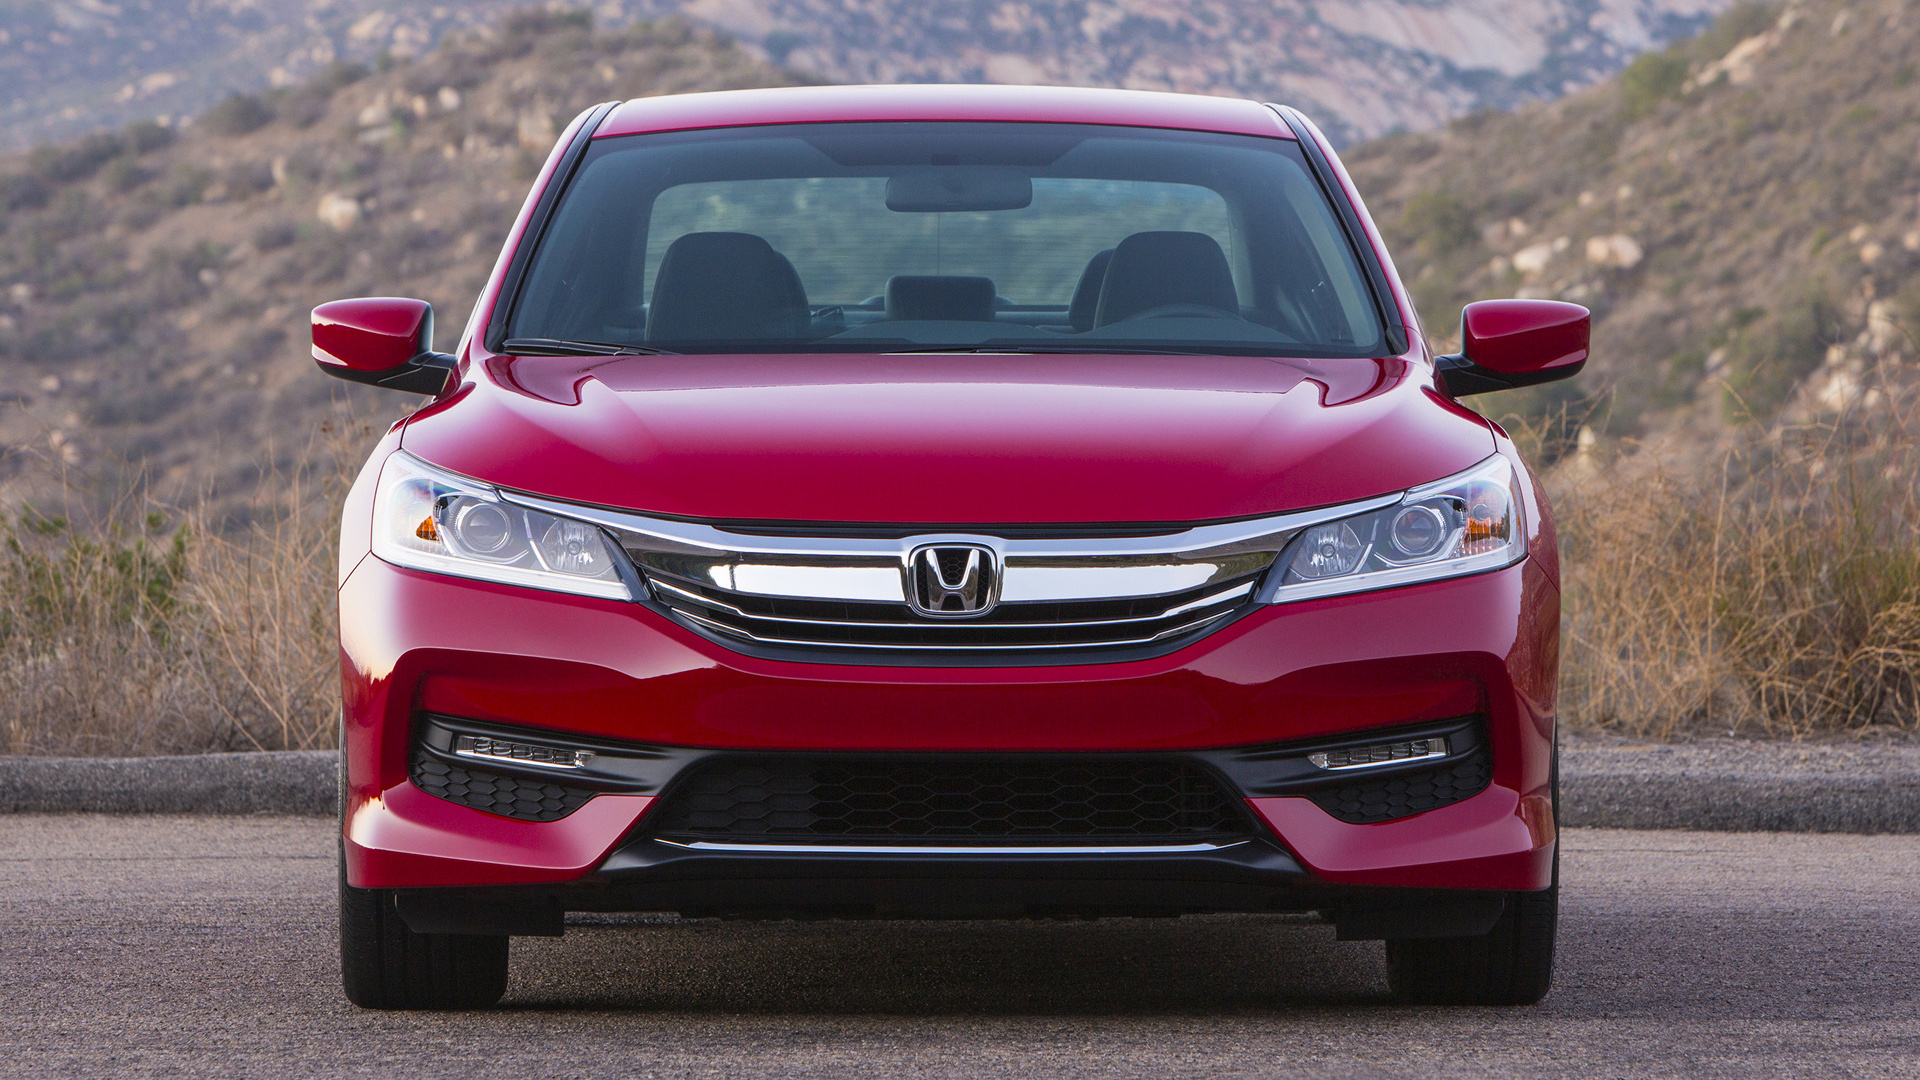 2016 Hyundai Genesis Coupe >> 2016 Honda Accord Sport (US) - Wallpapers and HD Images ...